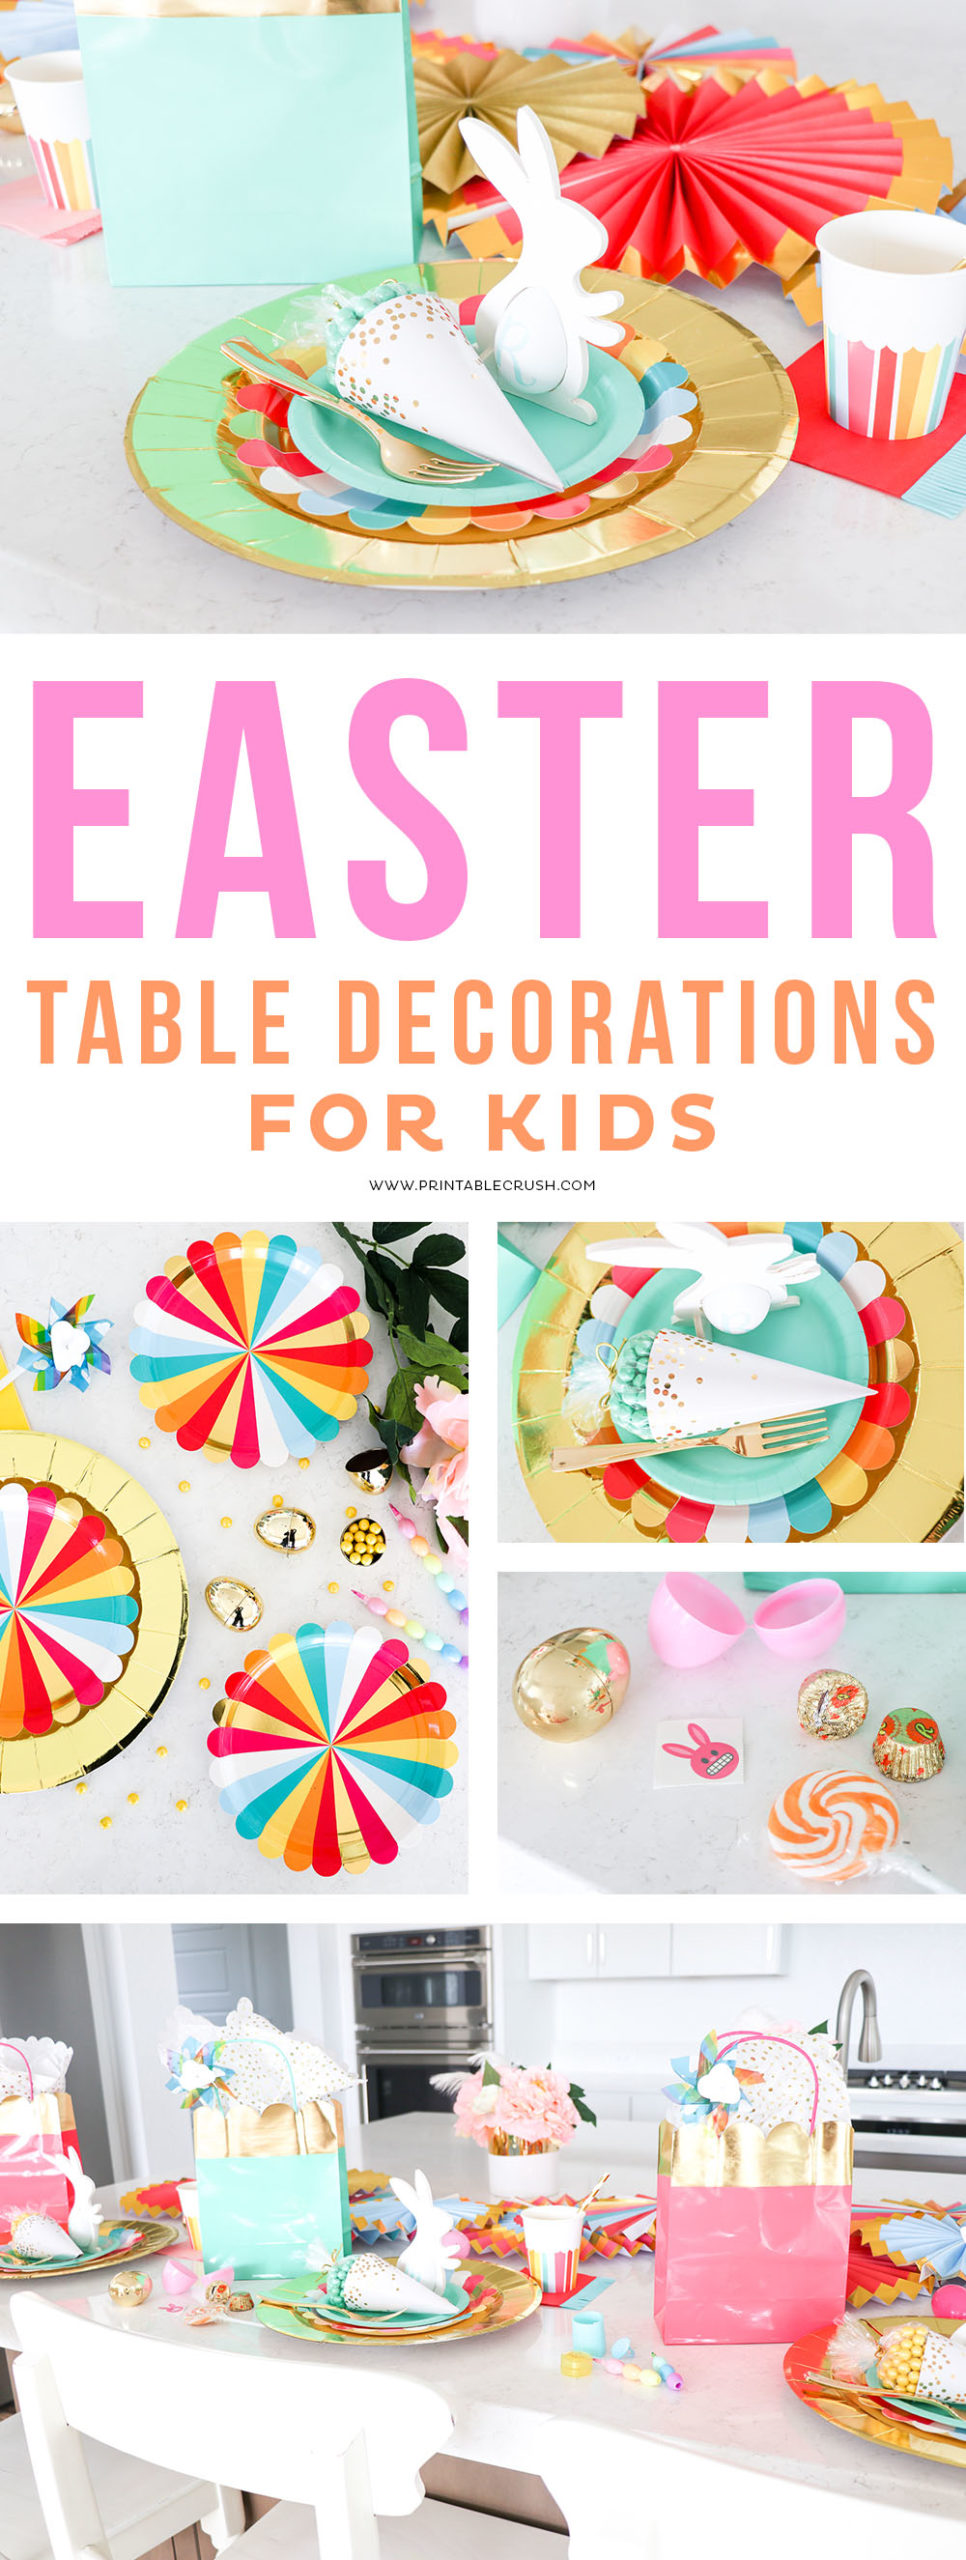 Easy Easter Table Decorations for Kids #easter #easterdecorations #easterforkids #easterparty #easterpartydecorations #orientaltrading via @printablecrush